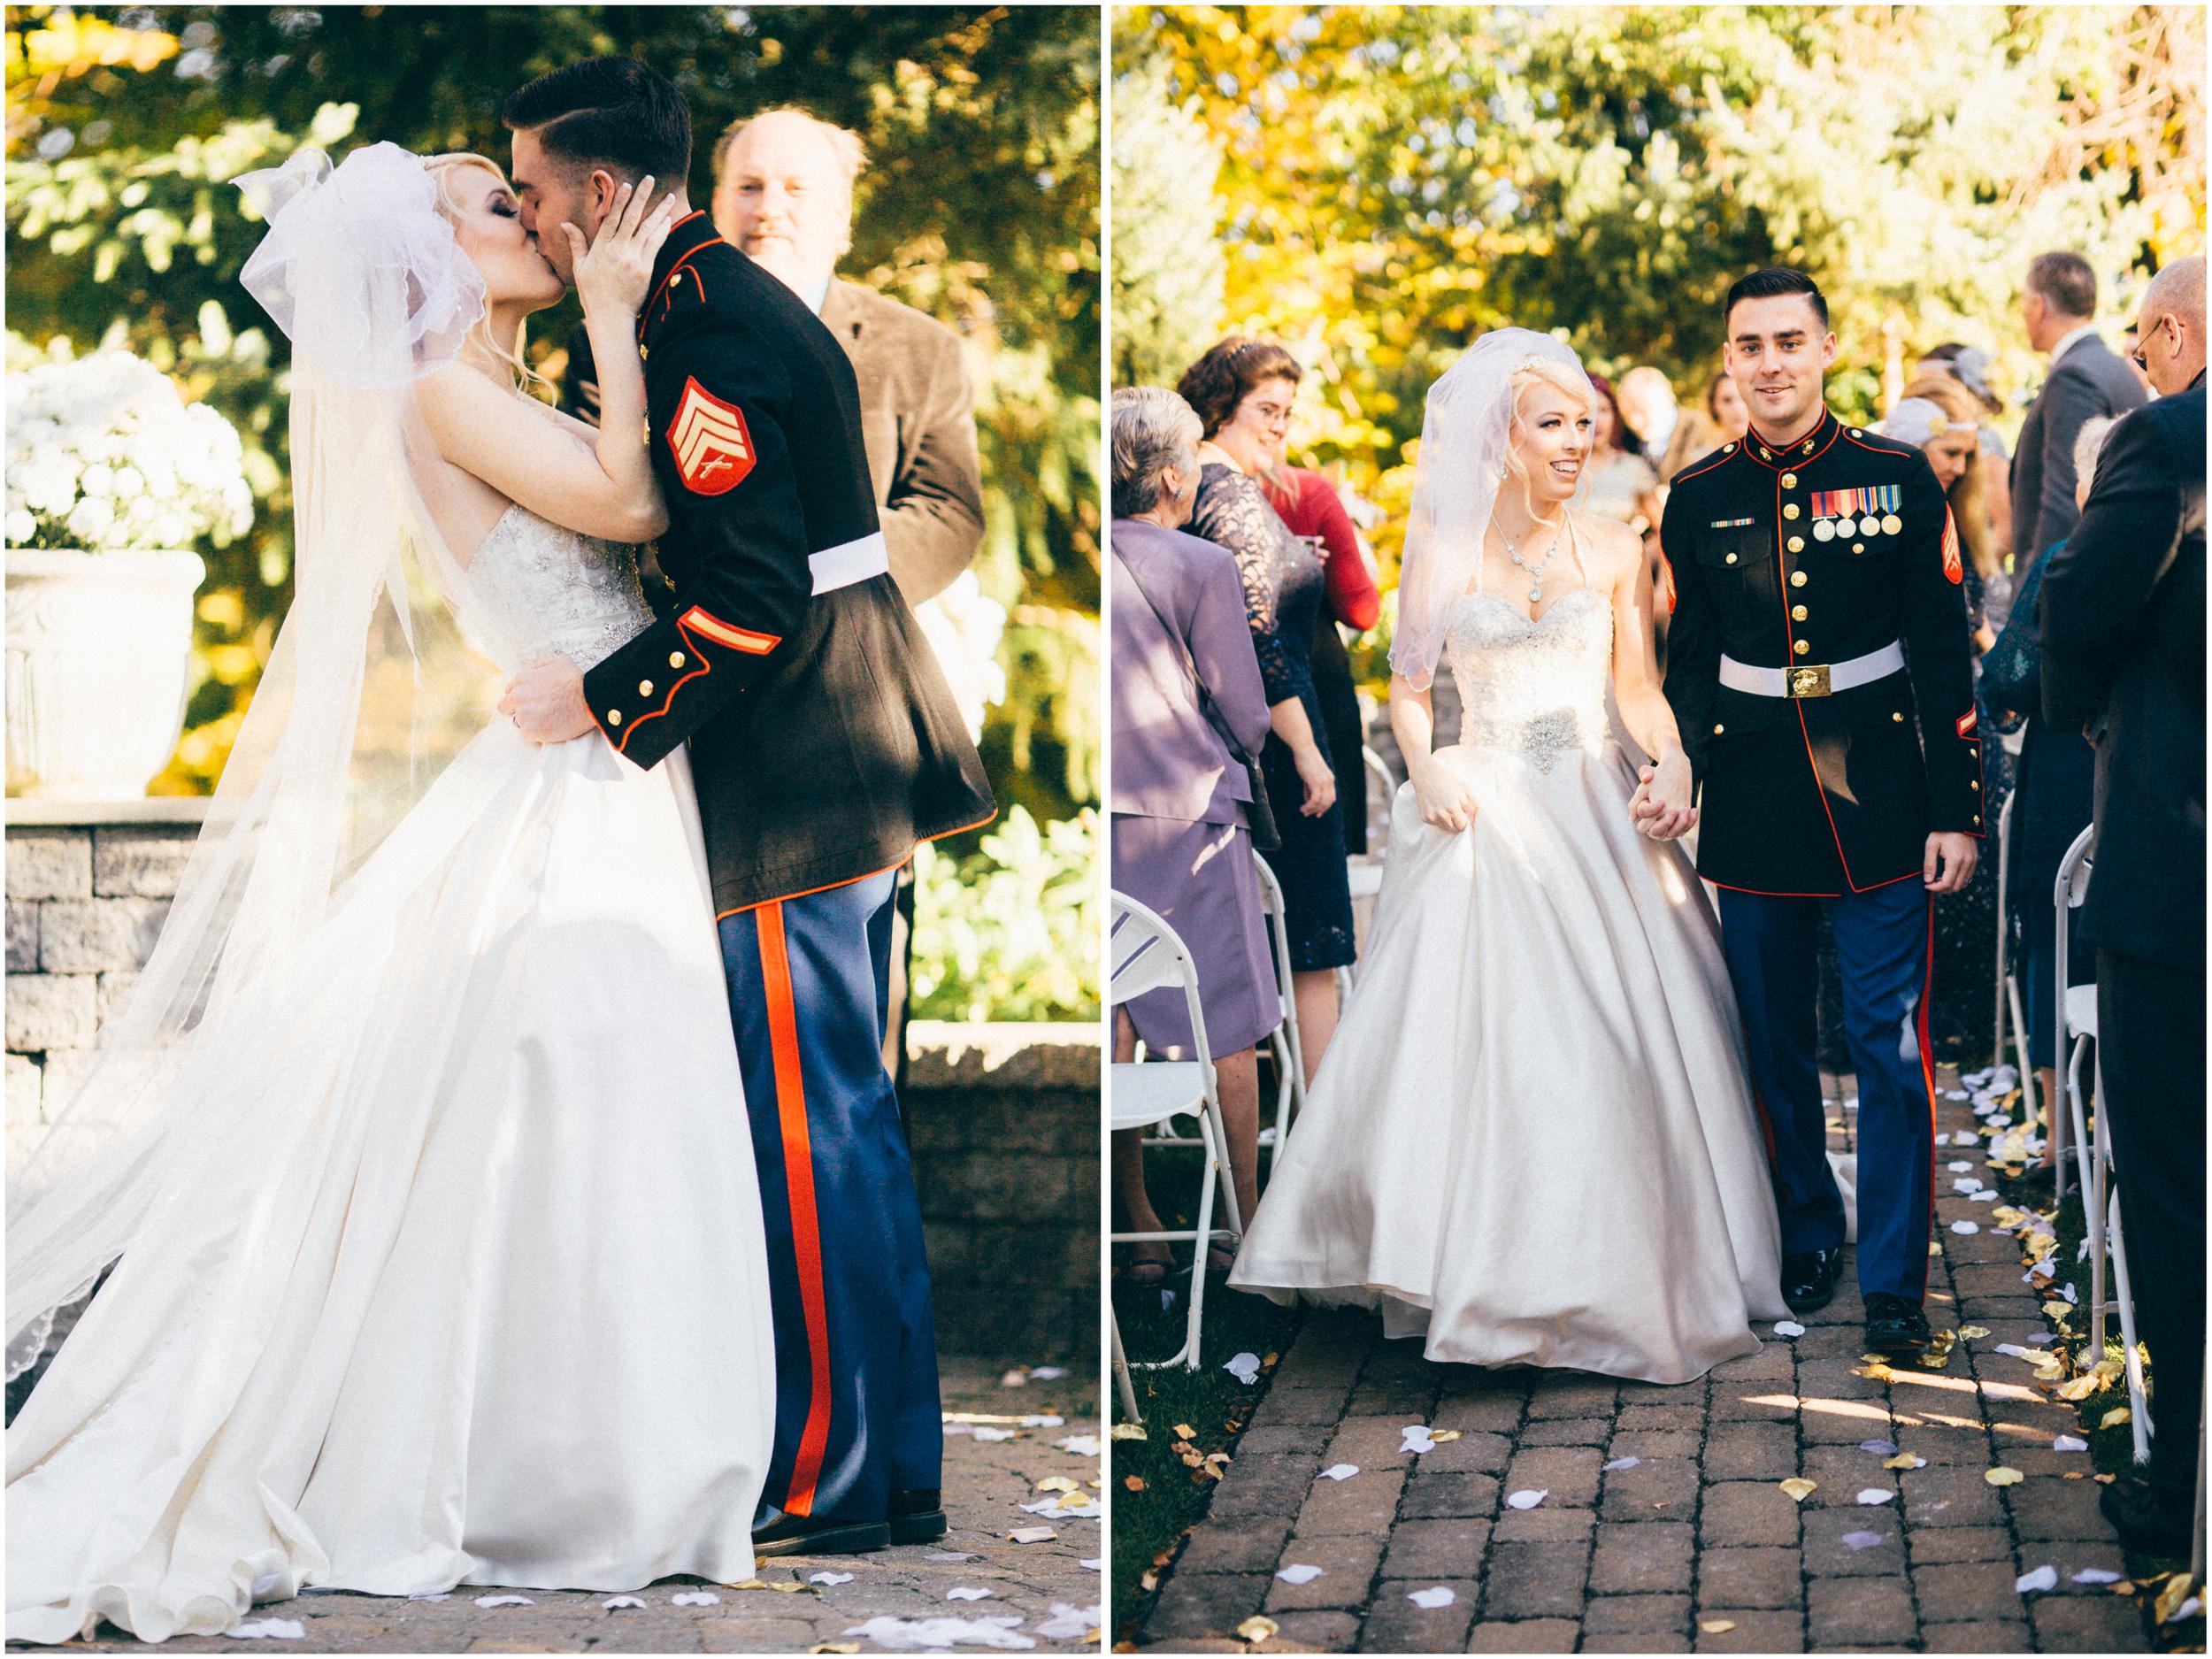 Luke_justine_CT_wedding10.jpg